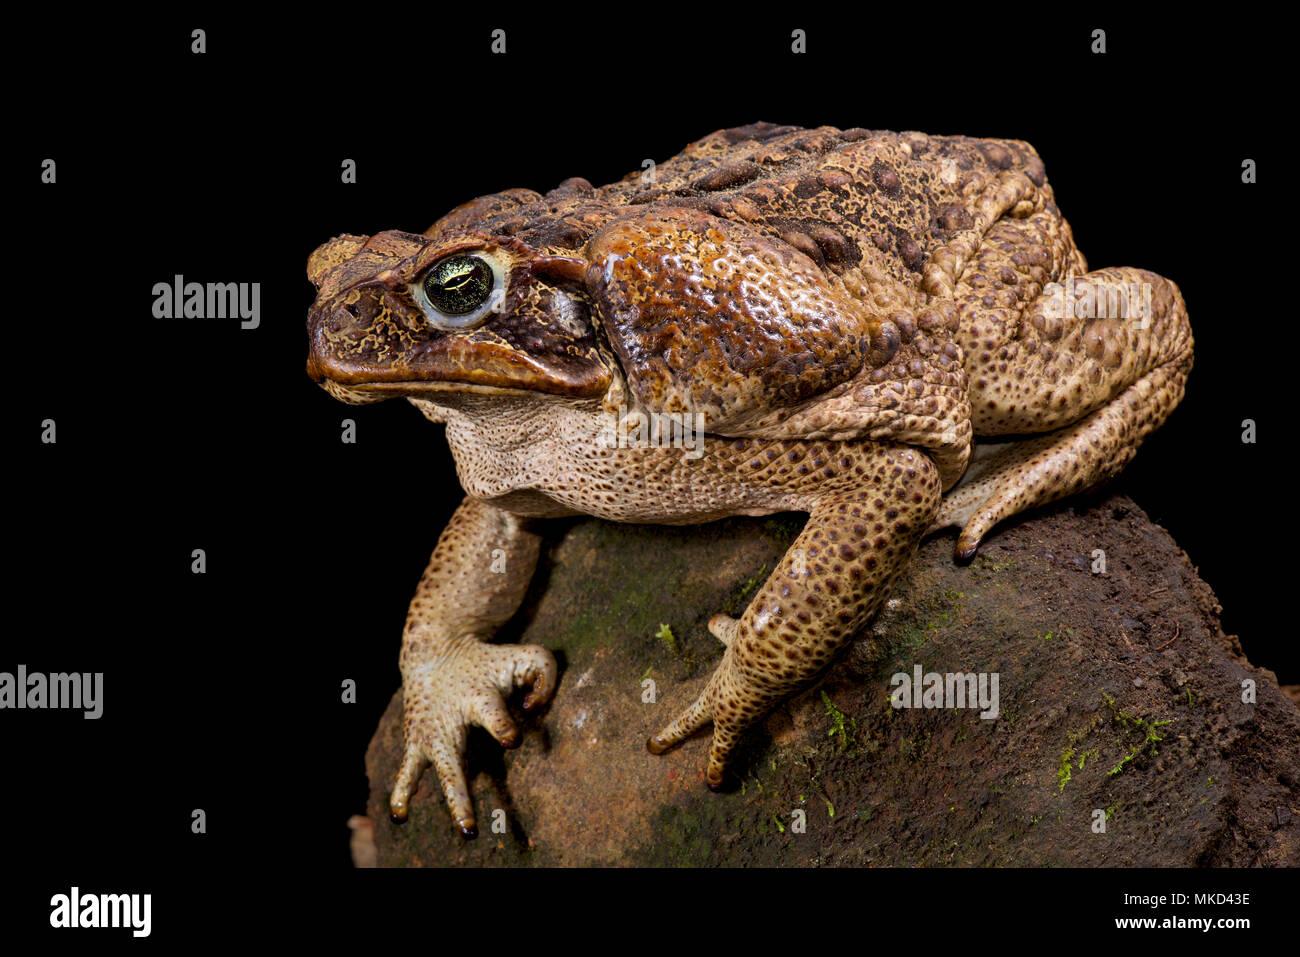 Giant toad (Rhinella marina) - Stock Image